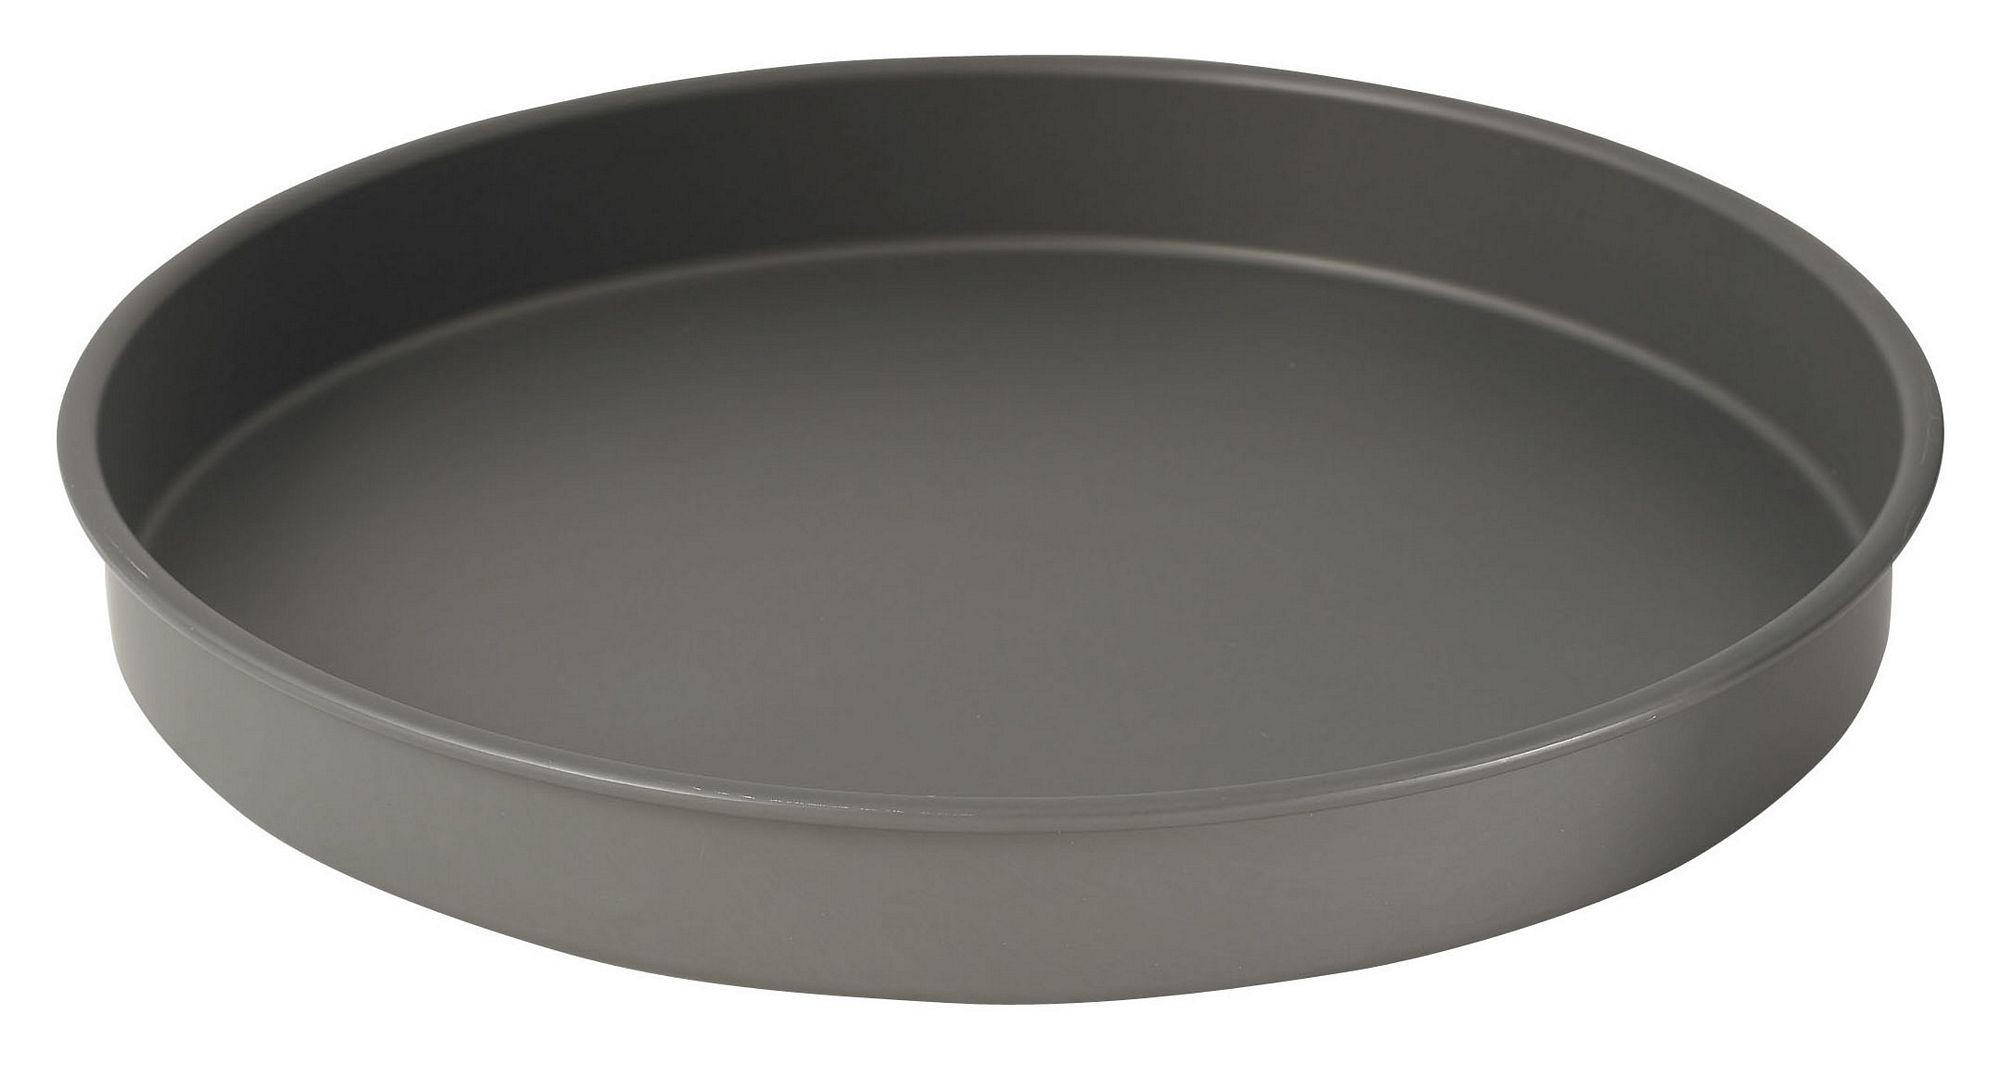 "Winco HAC-162 Hard Anodized Aluminum Cake Pan, 16"" Dia x 2"" H"